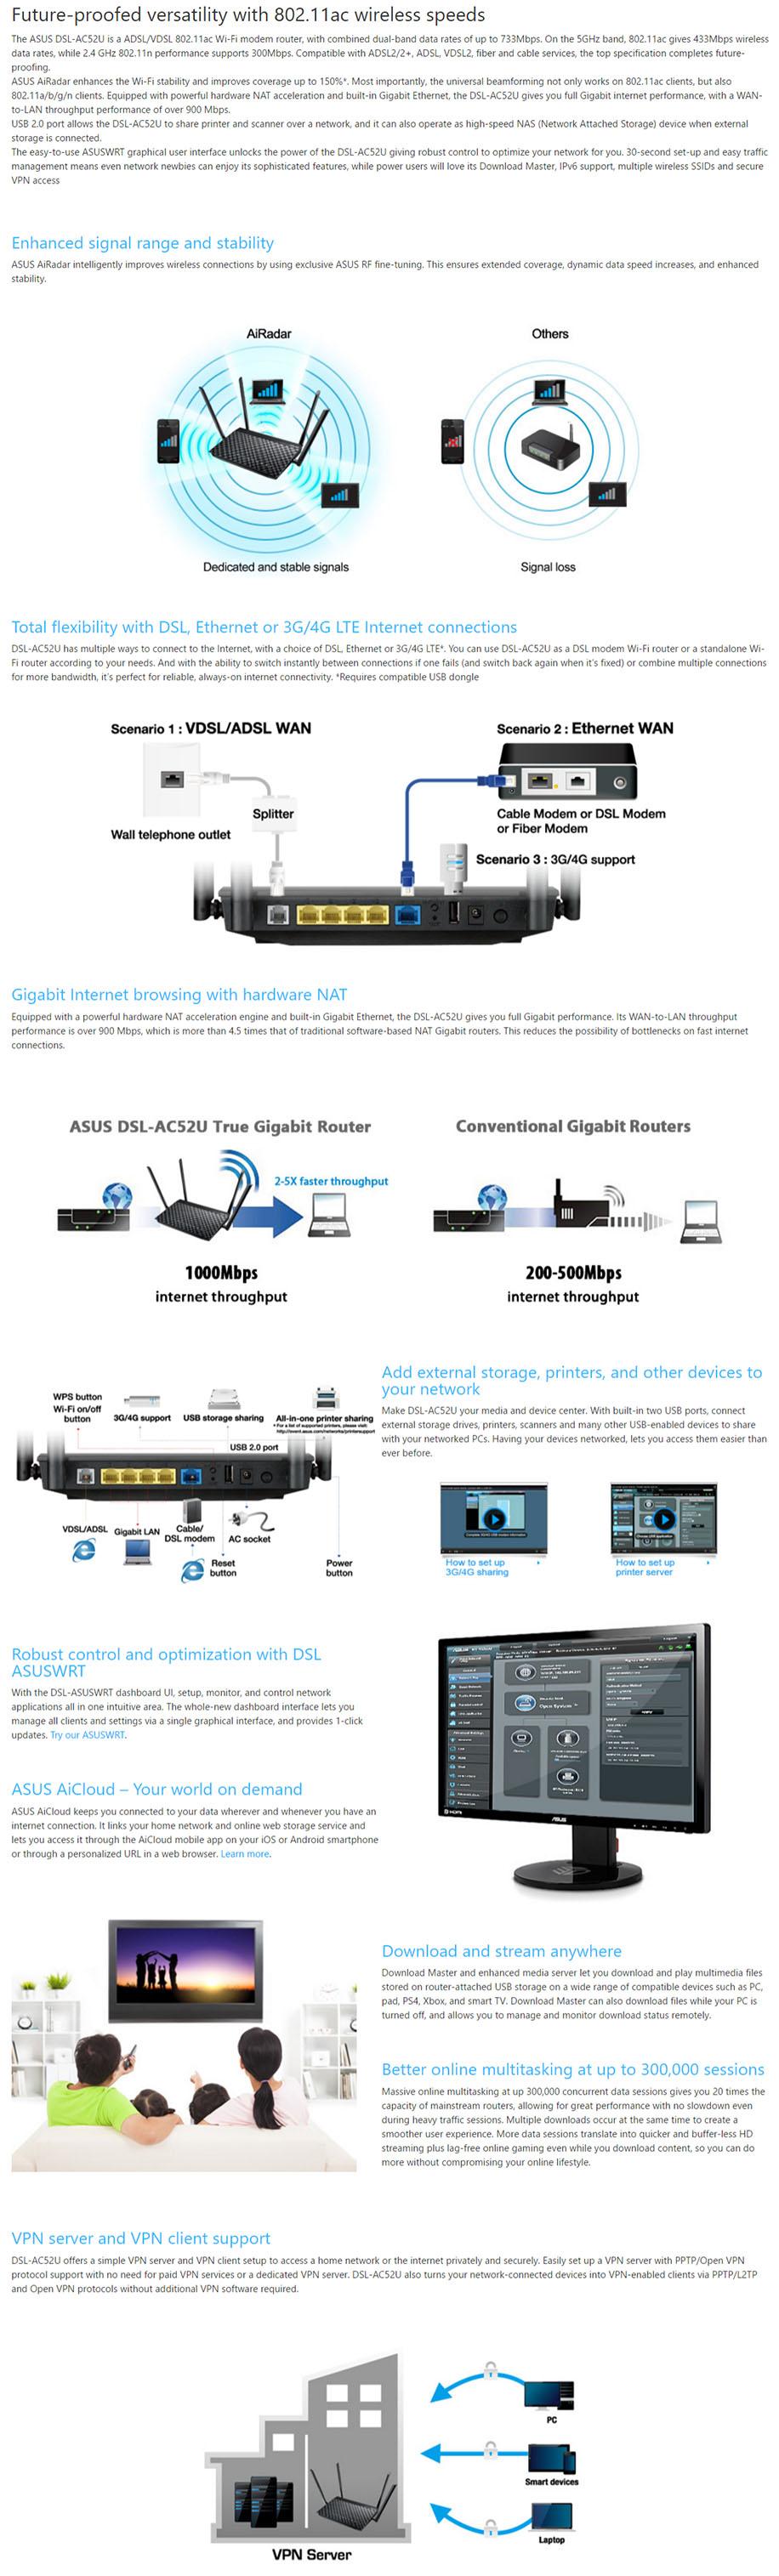 Asus Dsl Ac52u Dual Band 80211ac Wi Fi Adsl Vdsl Modem Router Fttn Diagram Of Connection